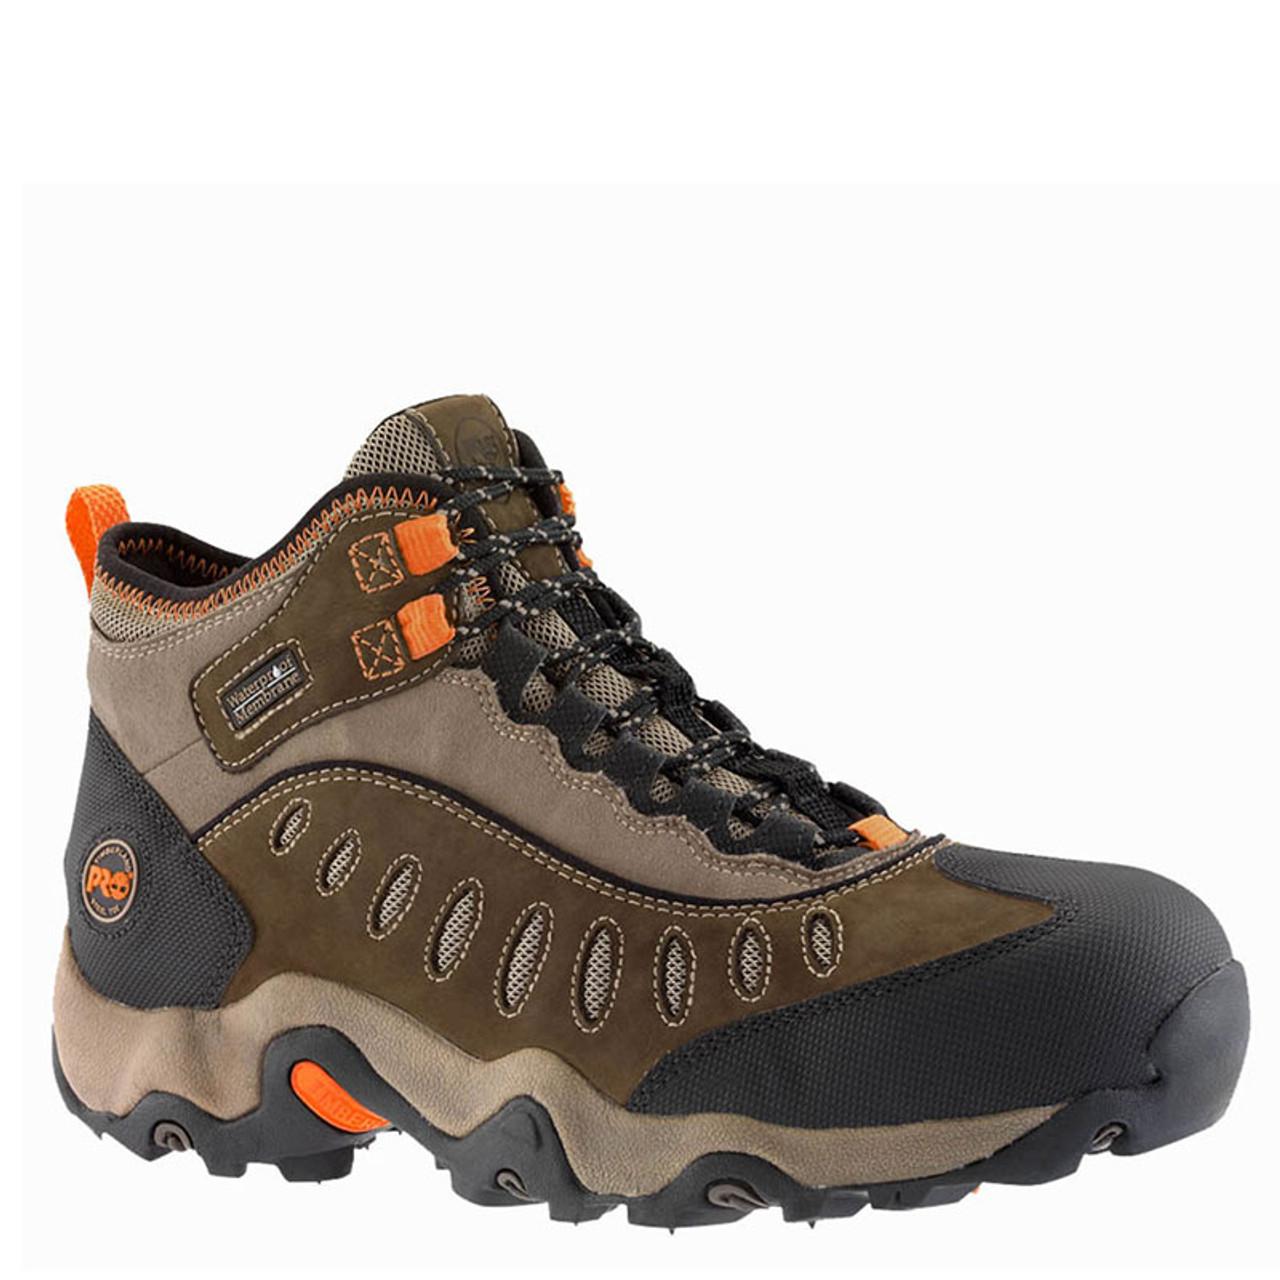 3f24df11053 Timberland PRO 86515214 MUDSLINGER Steel Toe Work Boots